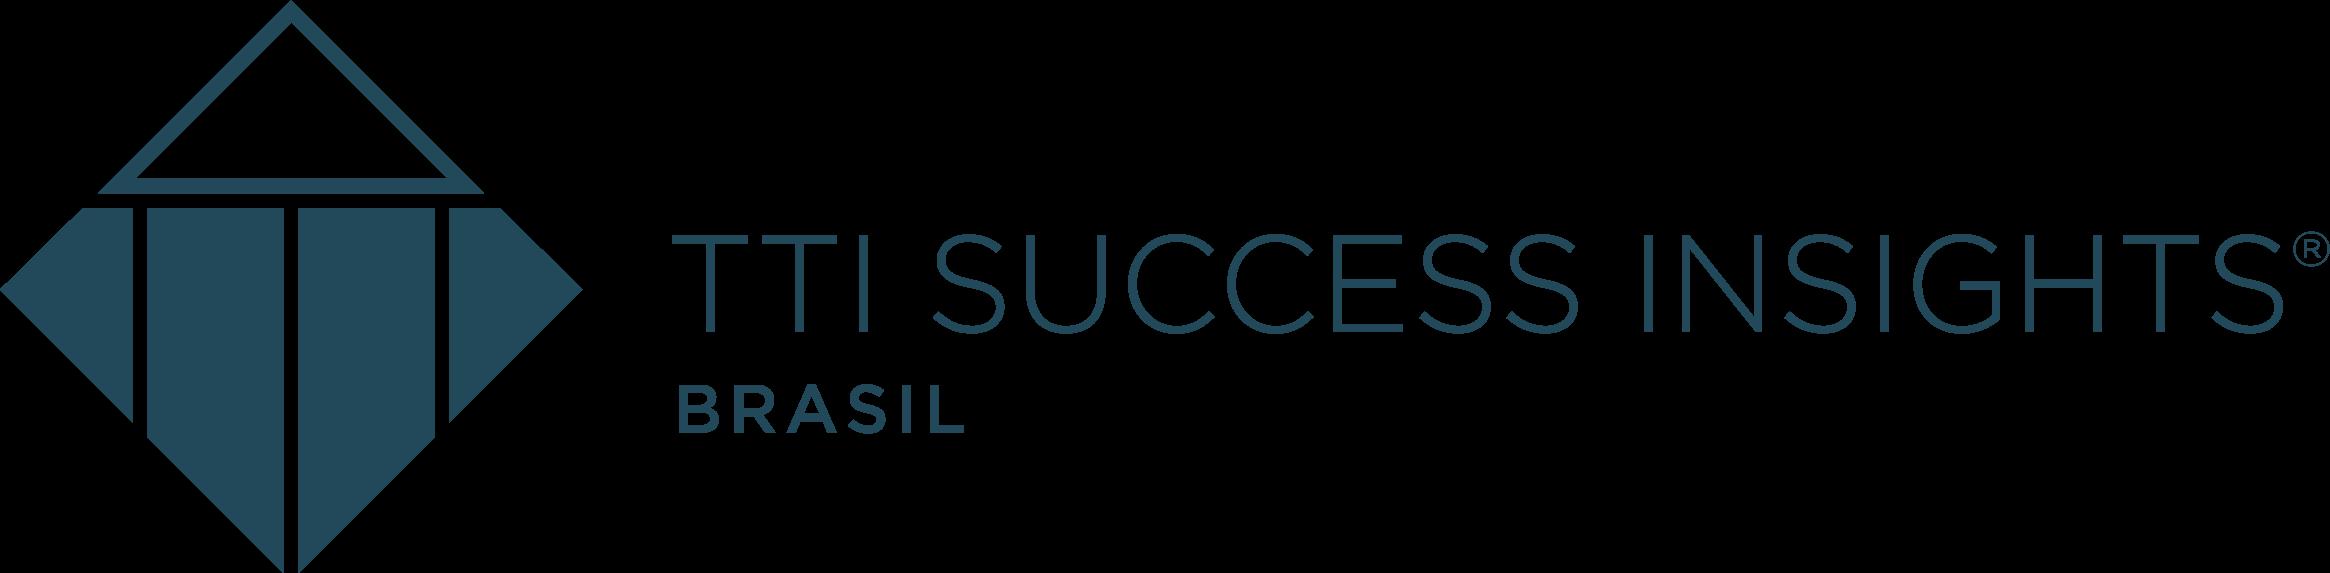 TTI Success Insights Brasil